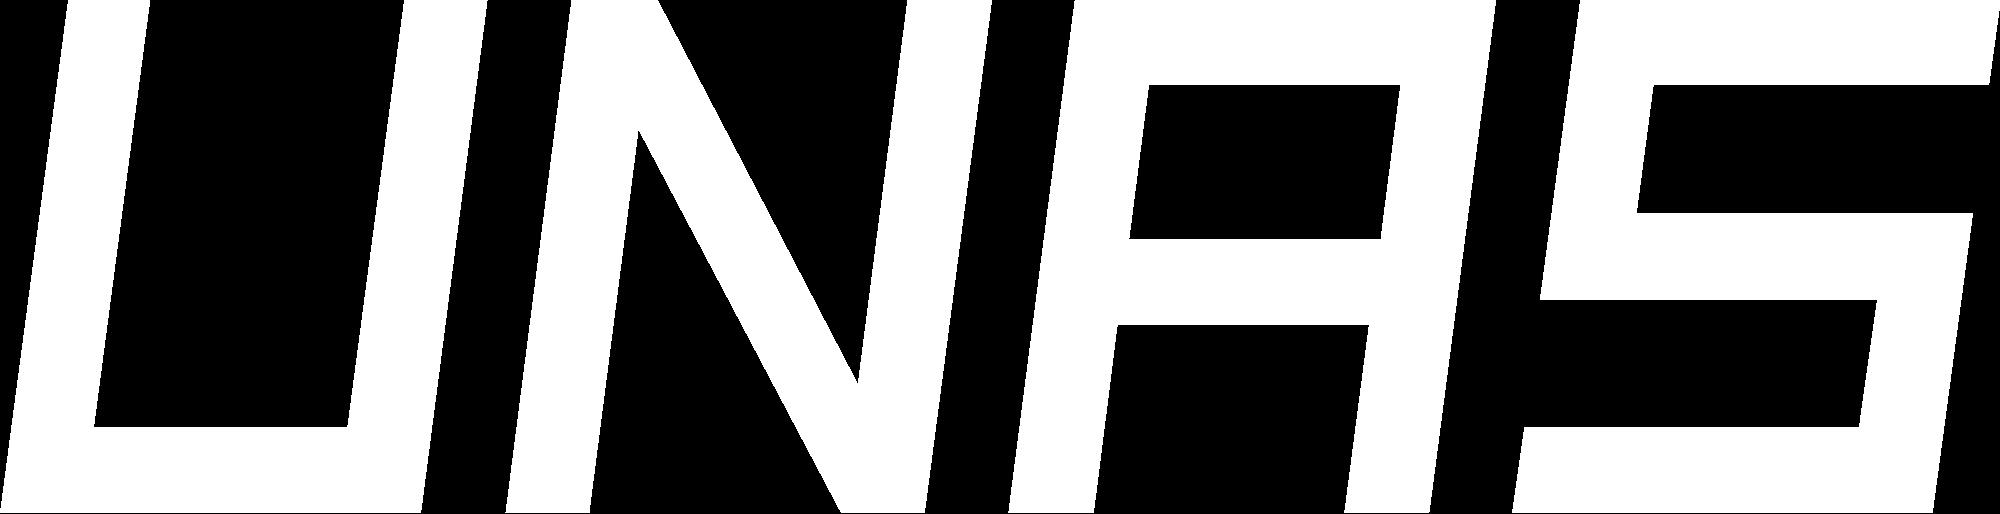 unas-feher-logo